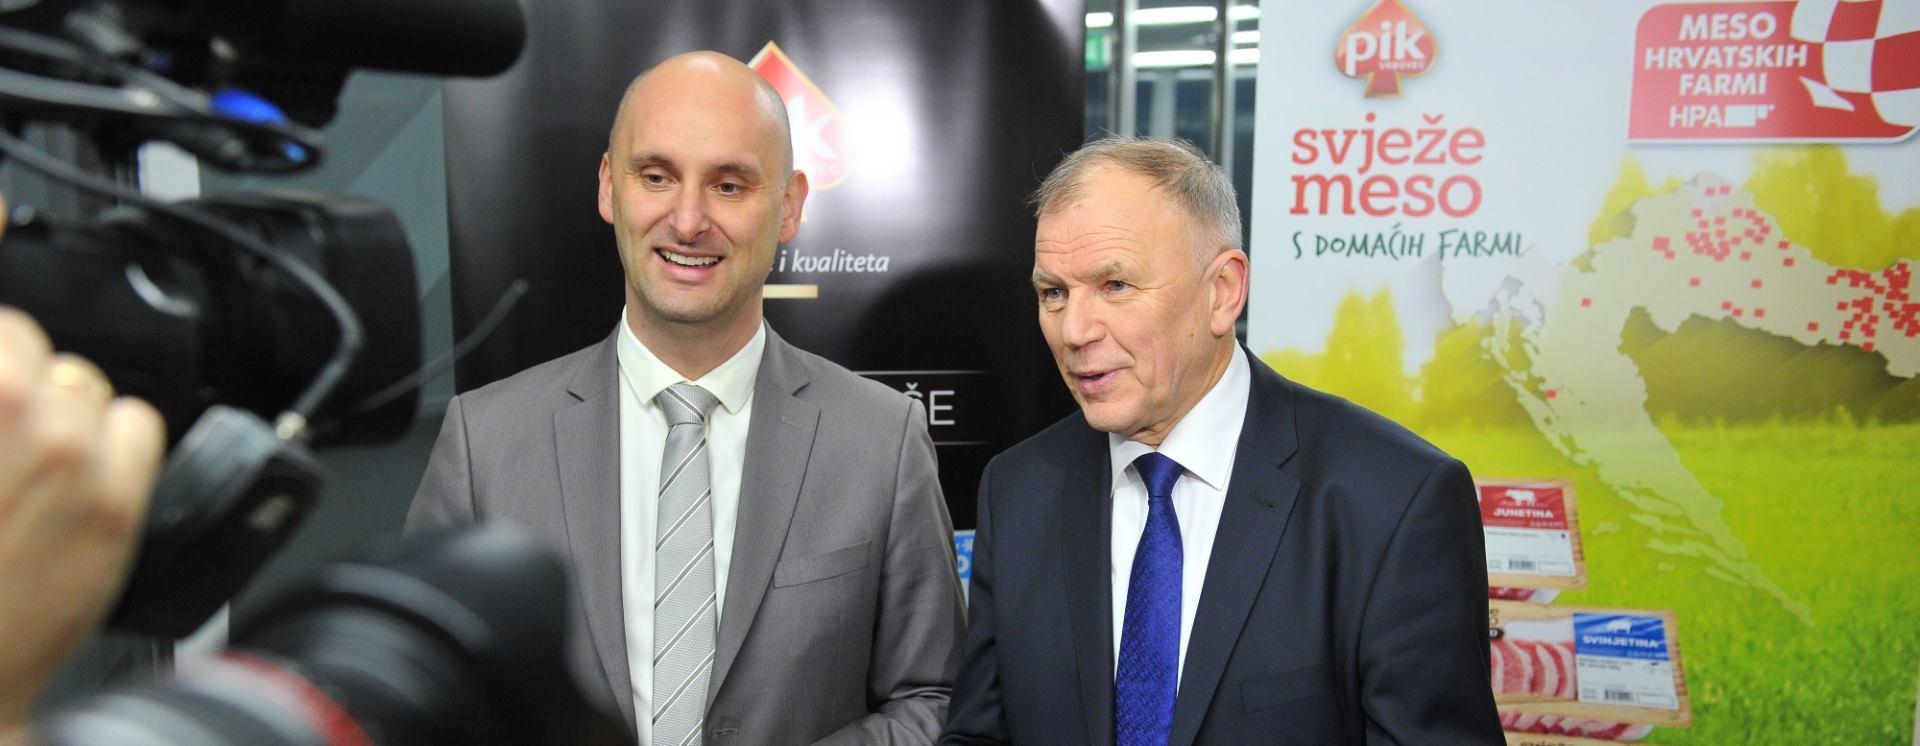 PIK VRBOVEC Europski povjerenik Vytenis Andriukaitis i ministar Tomislav Tolušić obavili radni posjet